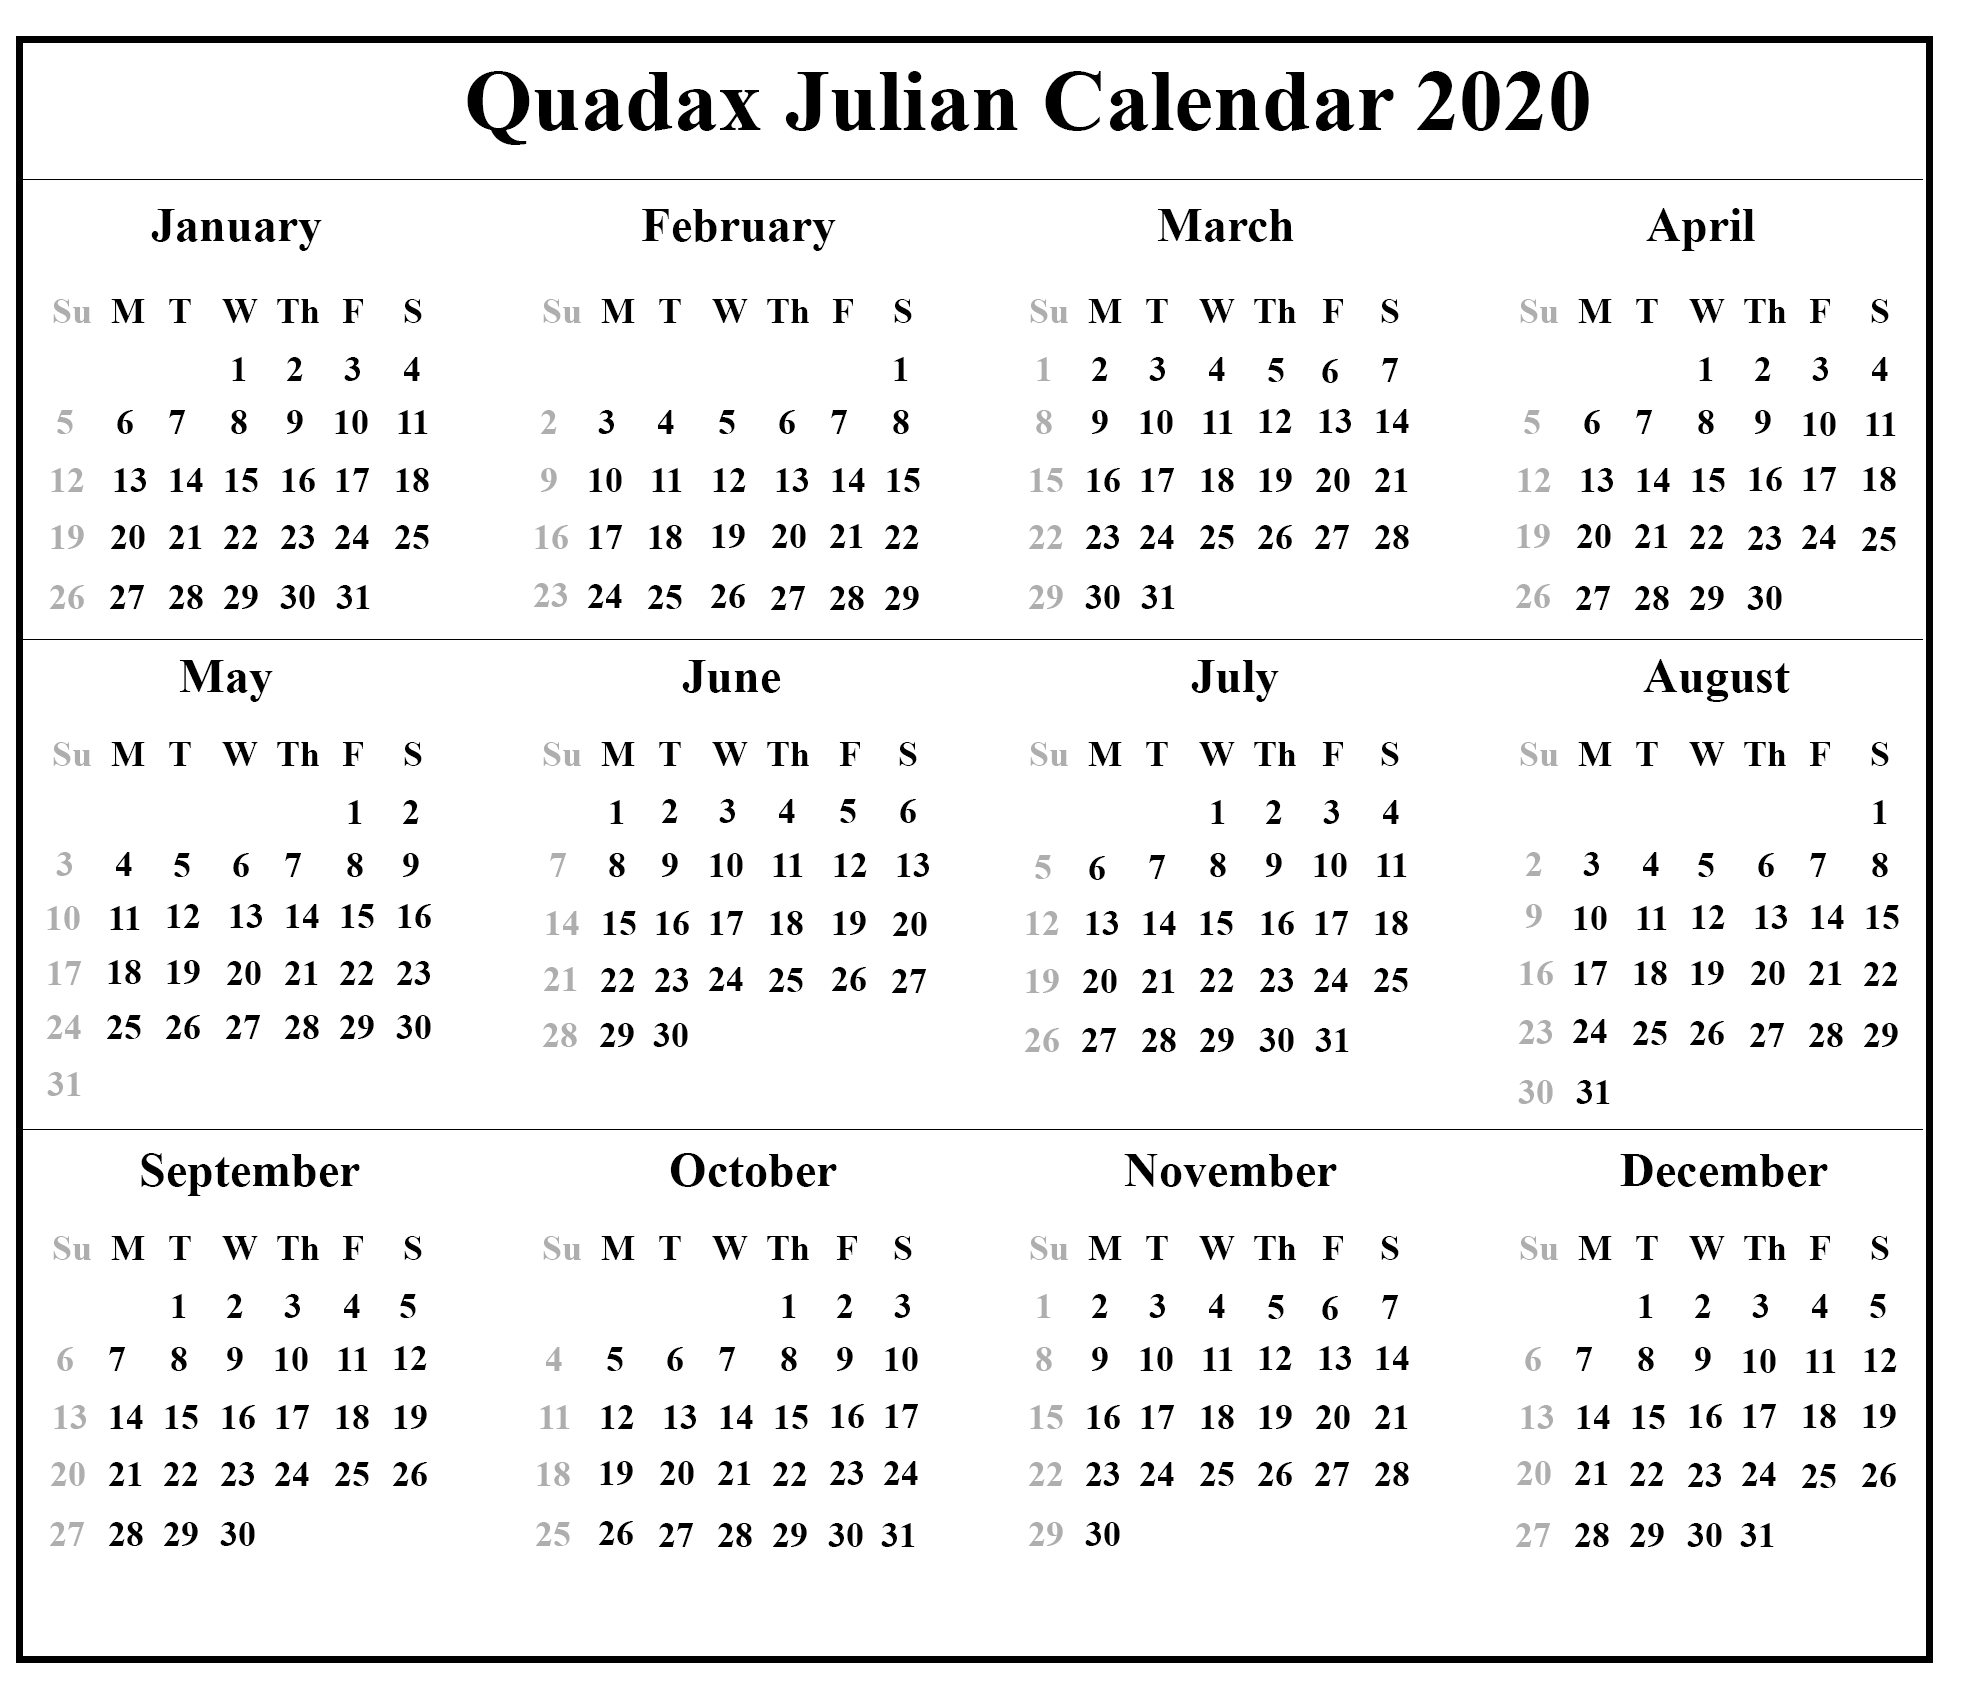 Free Printable Julian Calendar 2020 Template | Printable